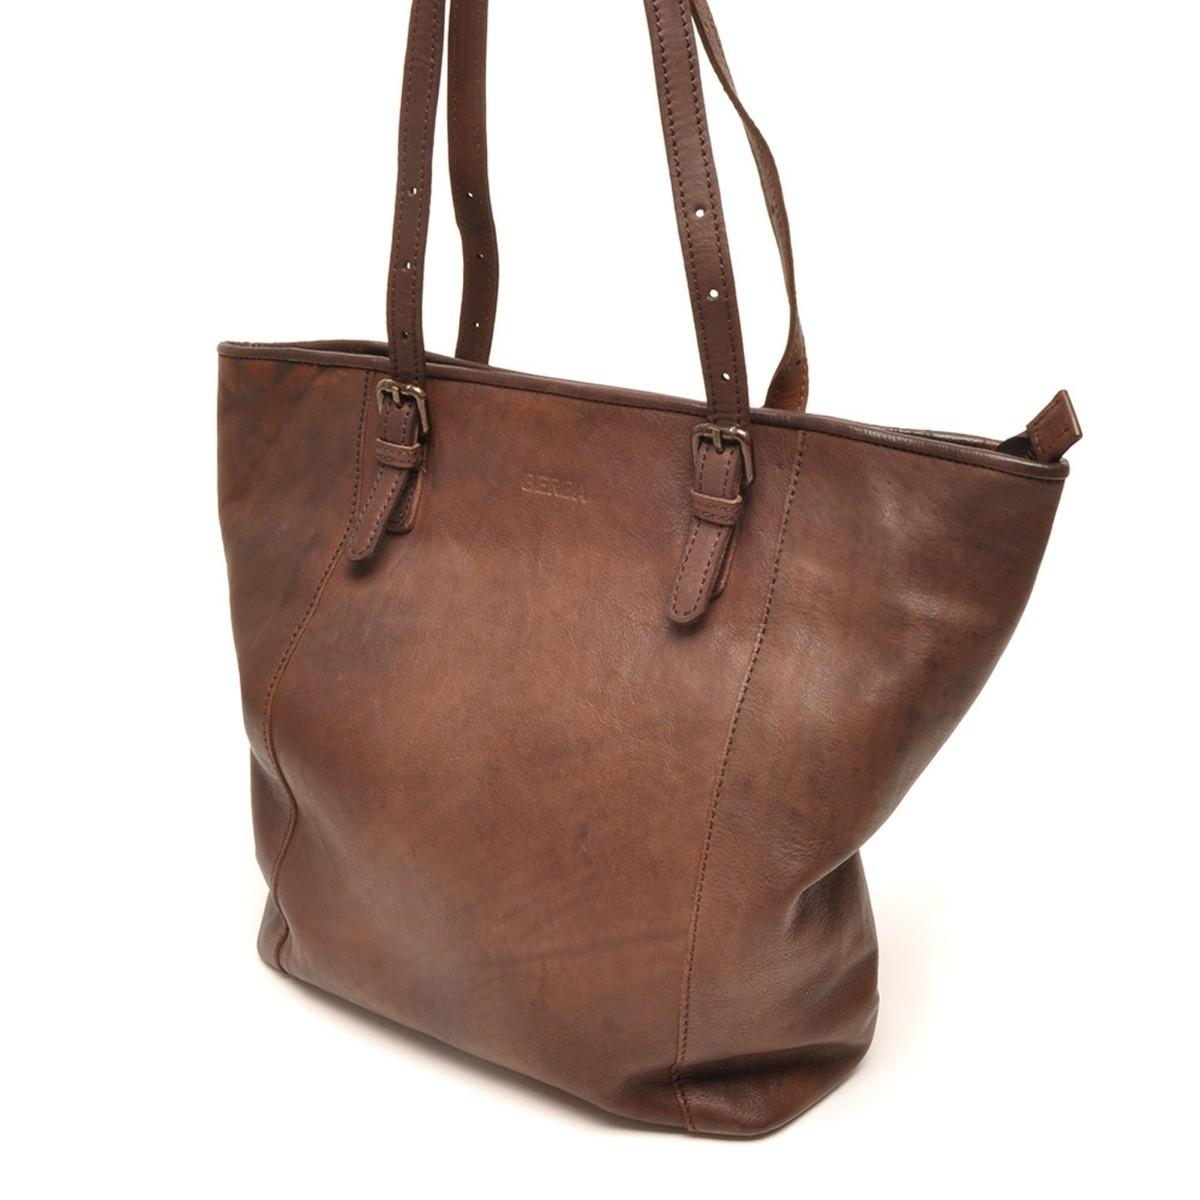 berba Sion 502 - Shopper in dark brown